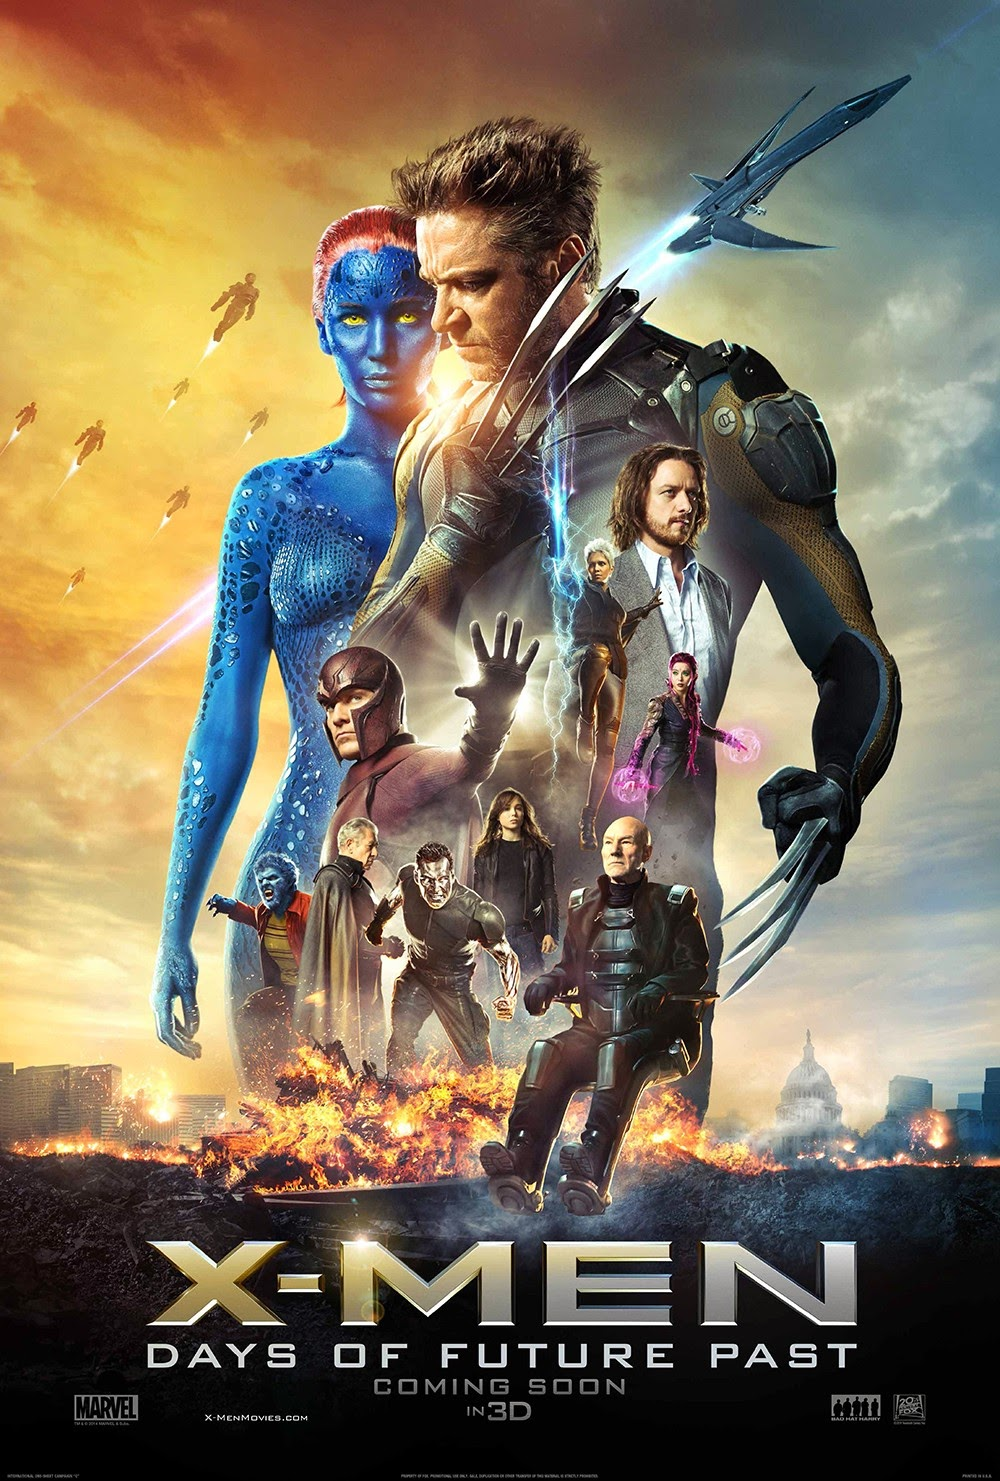 ¡Cartelicos!: X-Men Días del Futuro Pasado